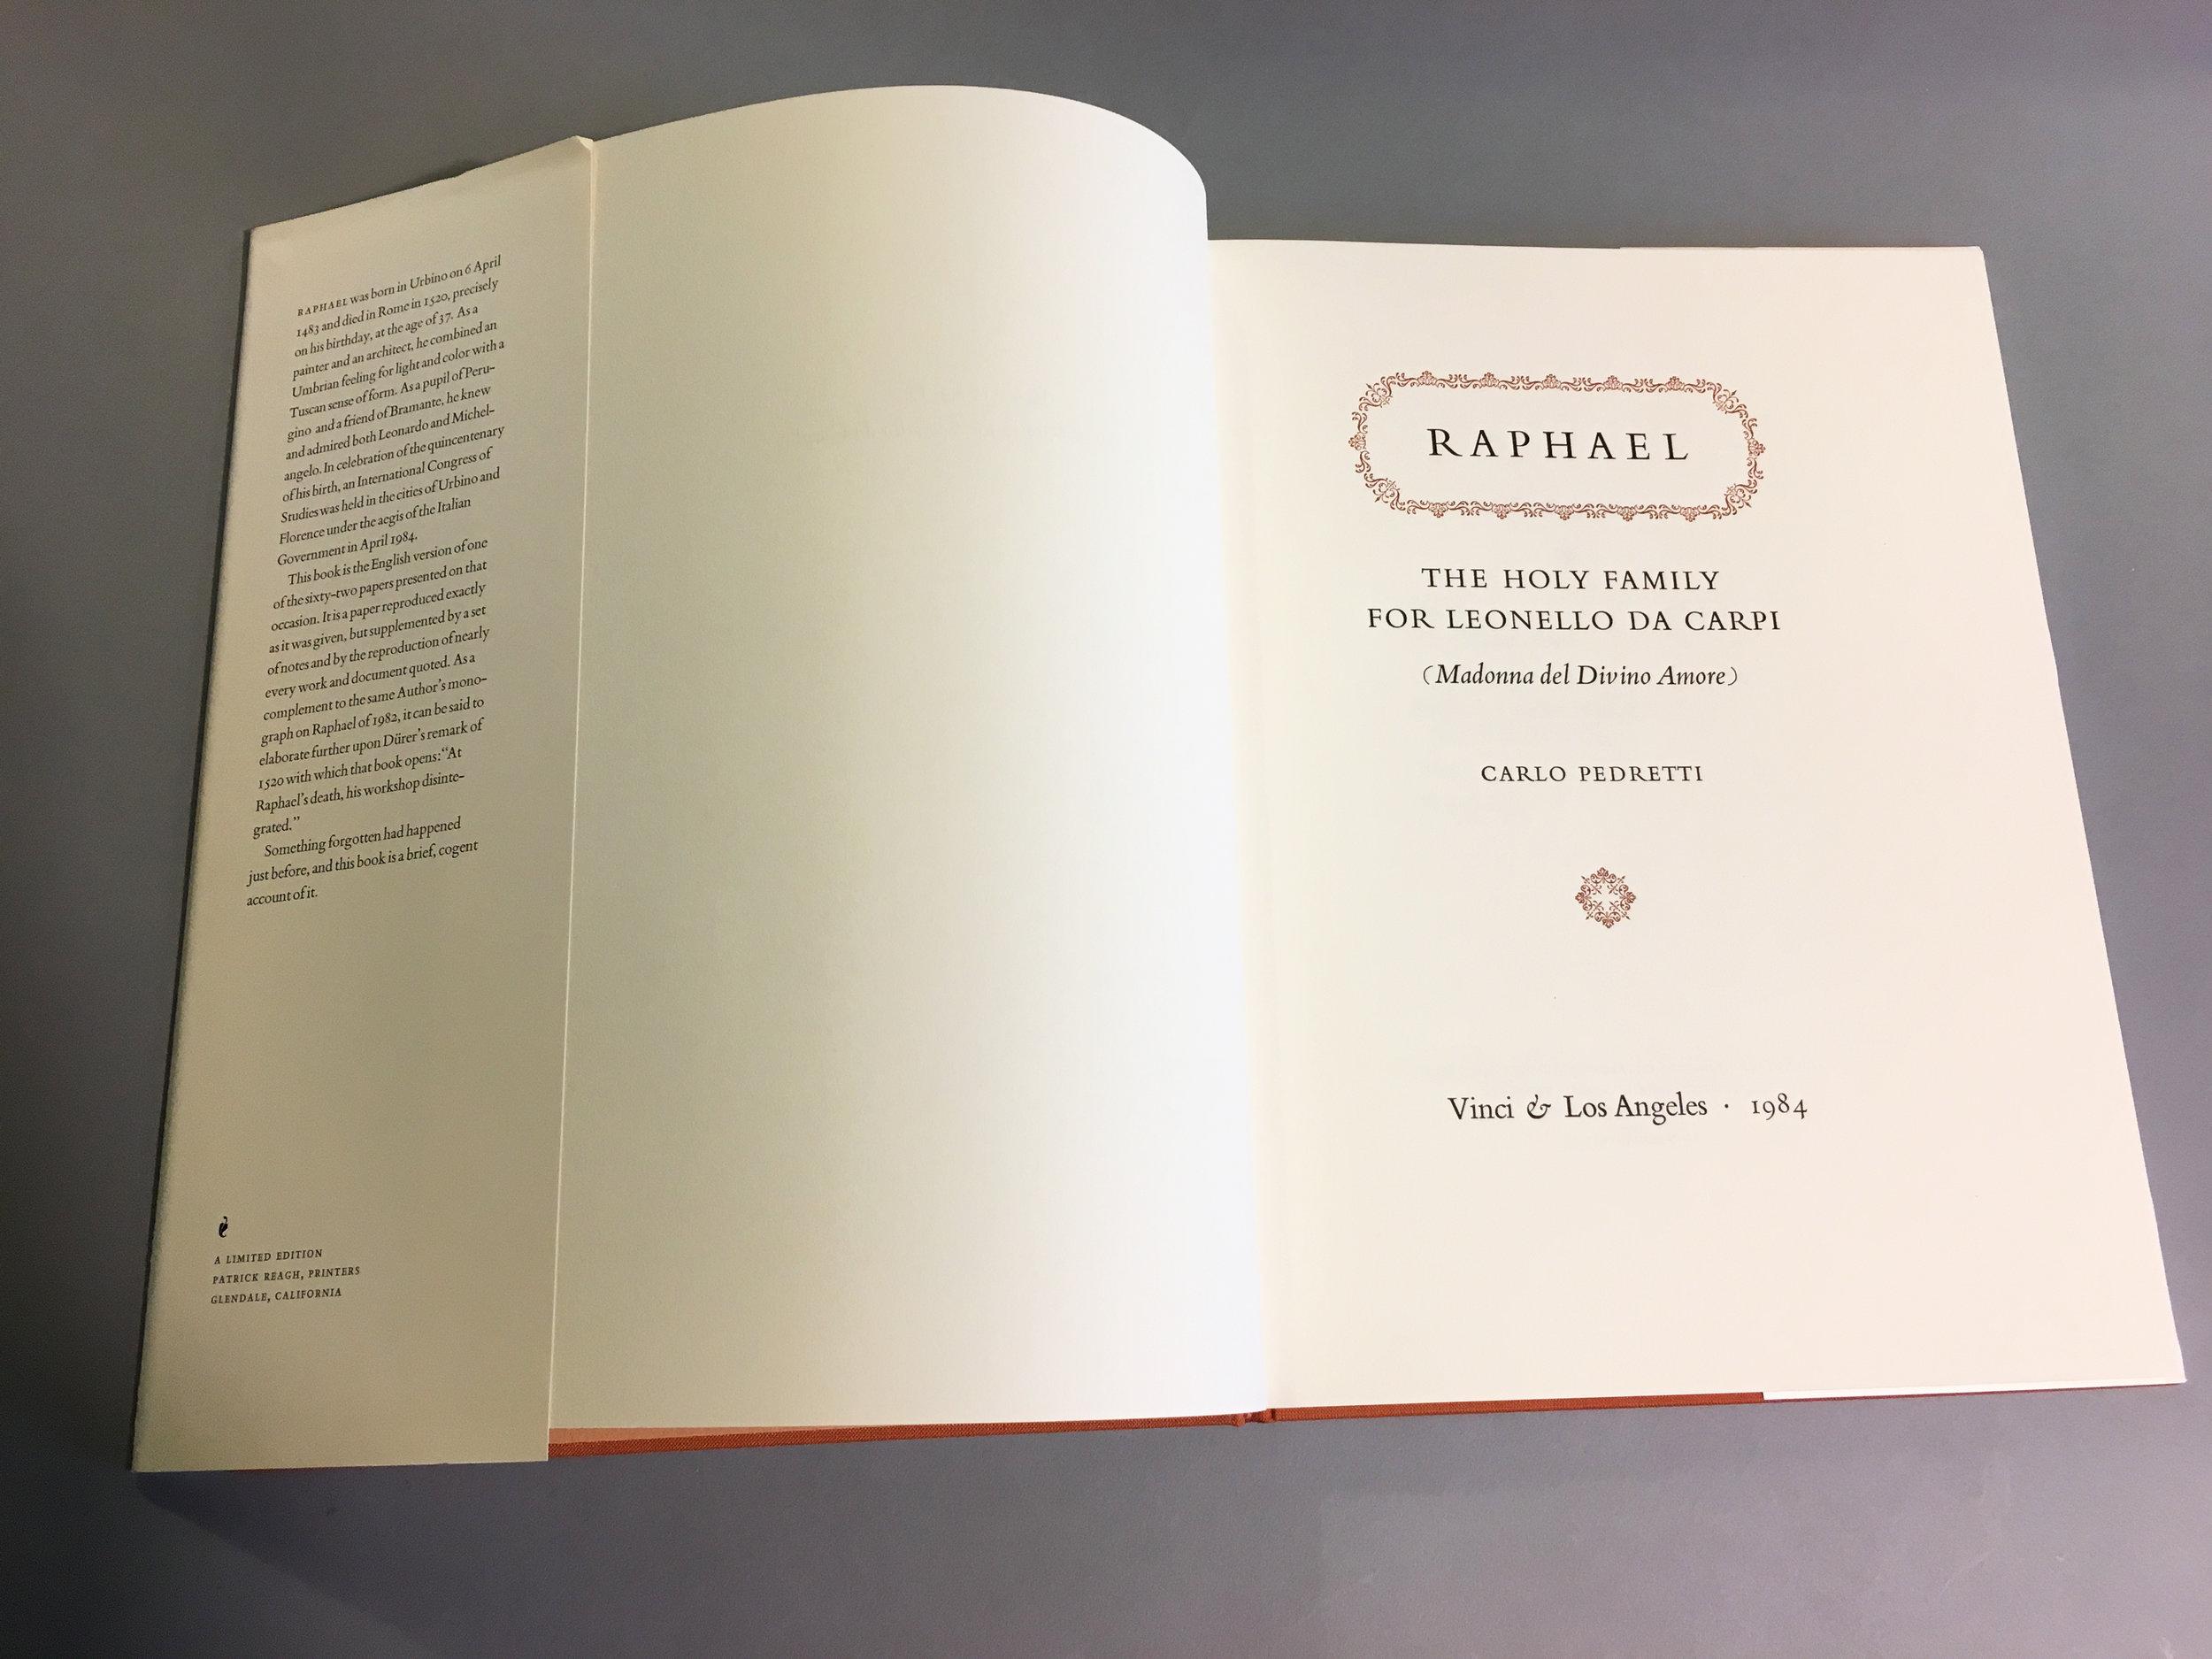 Raphael-2.jpg